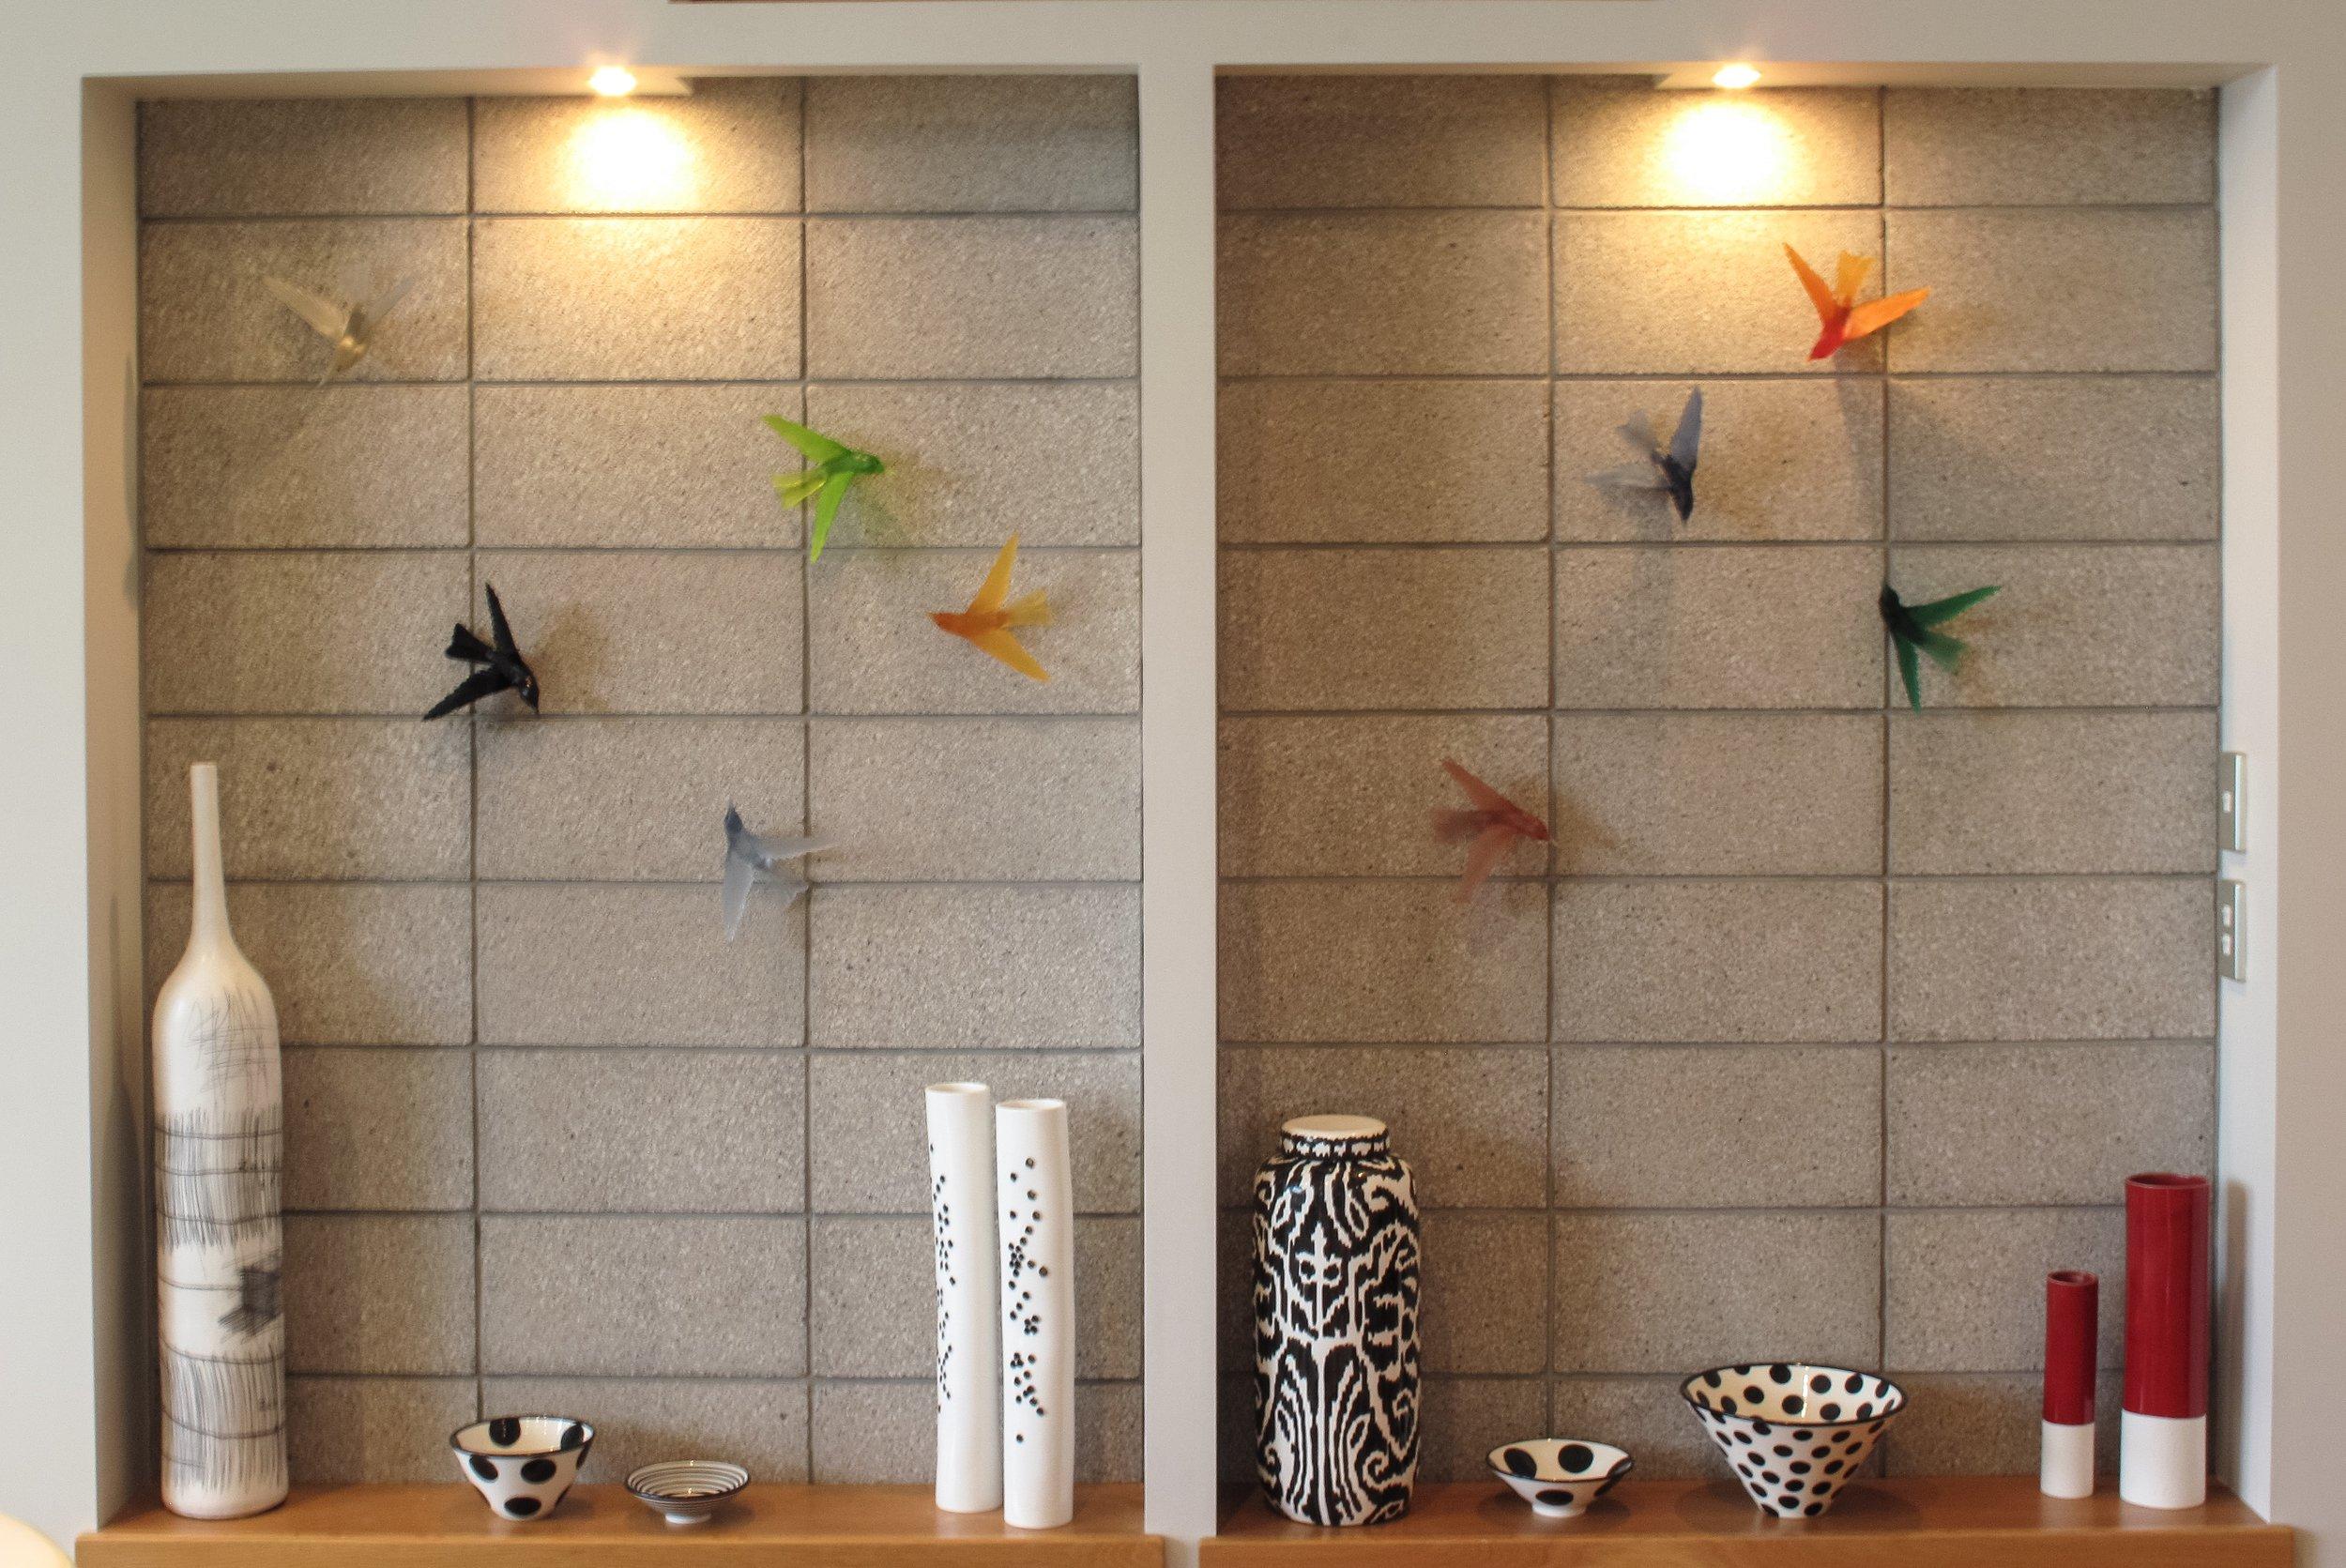 cast glass birds on block wall